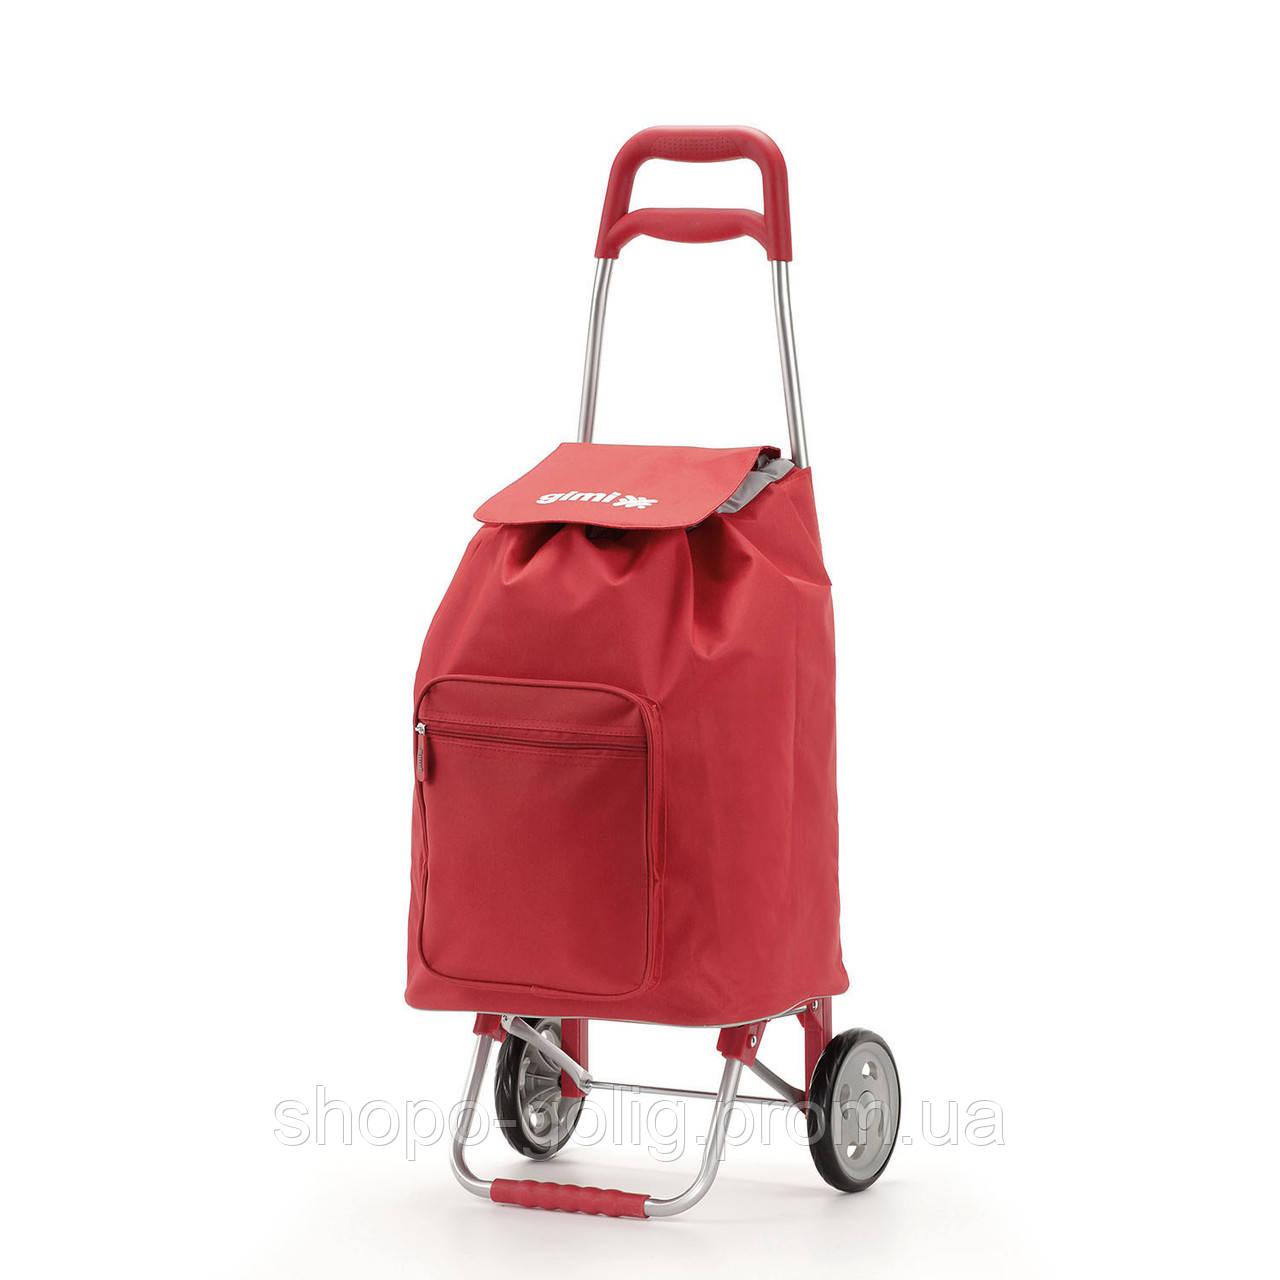 a2c0f4f0bf59 Сумка хозяйственная на колесиках Argo, красная, 37x33x95,6 см ...